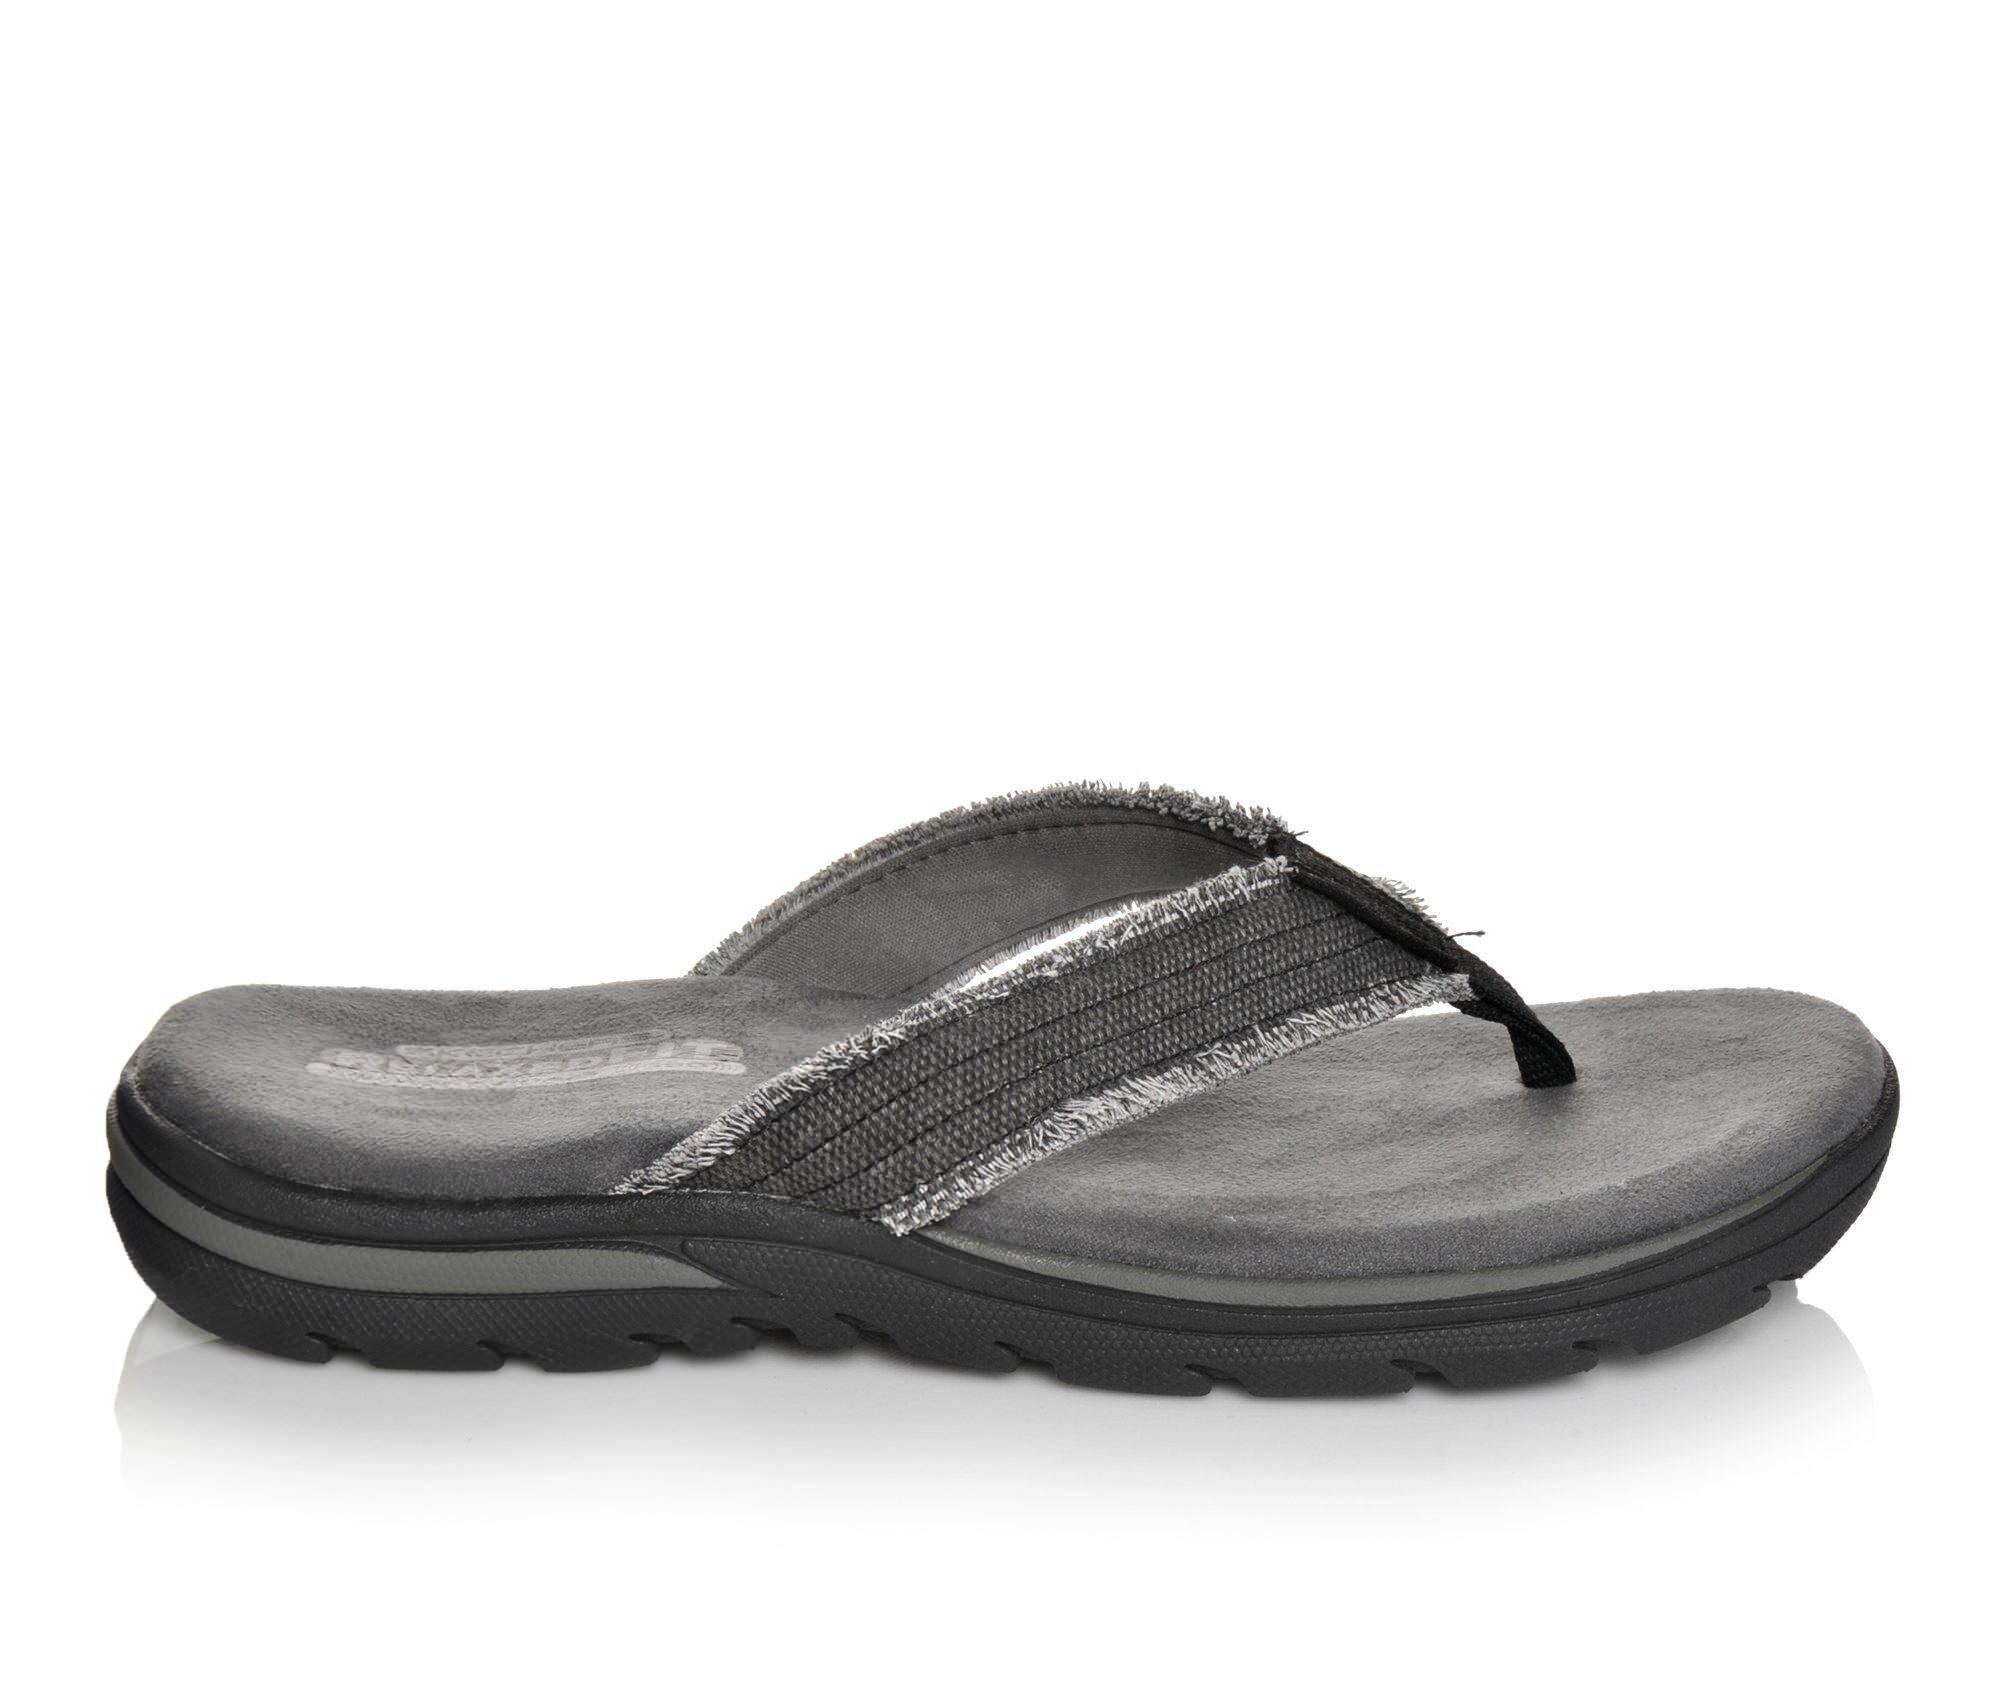 Buy Limited Edition Men's Skechers Bosnia 64152 Flip-Flops Black